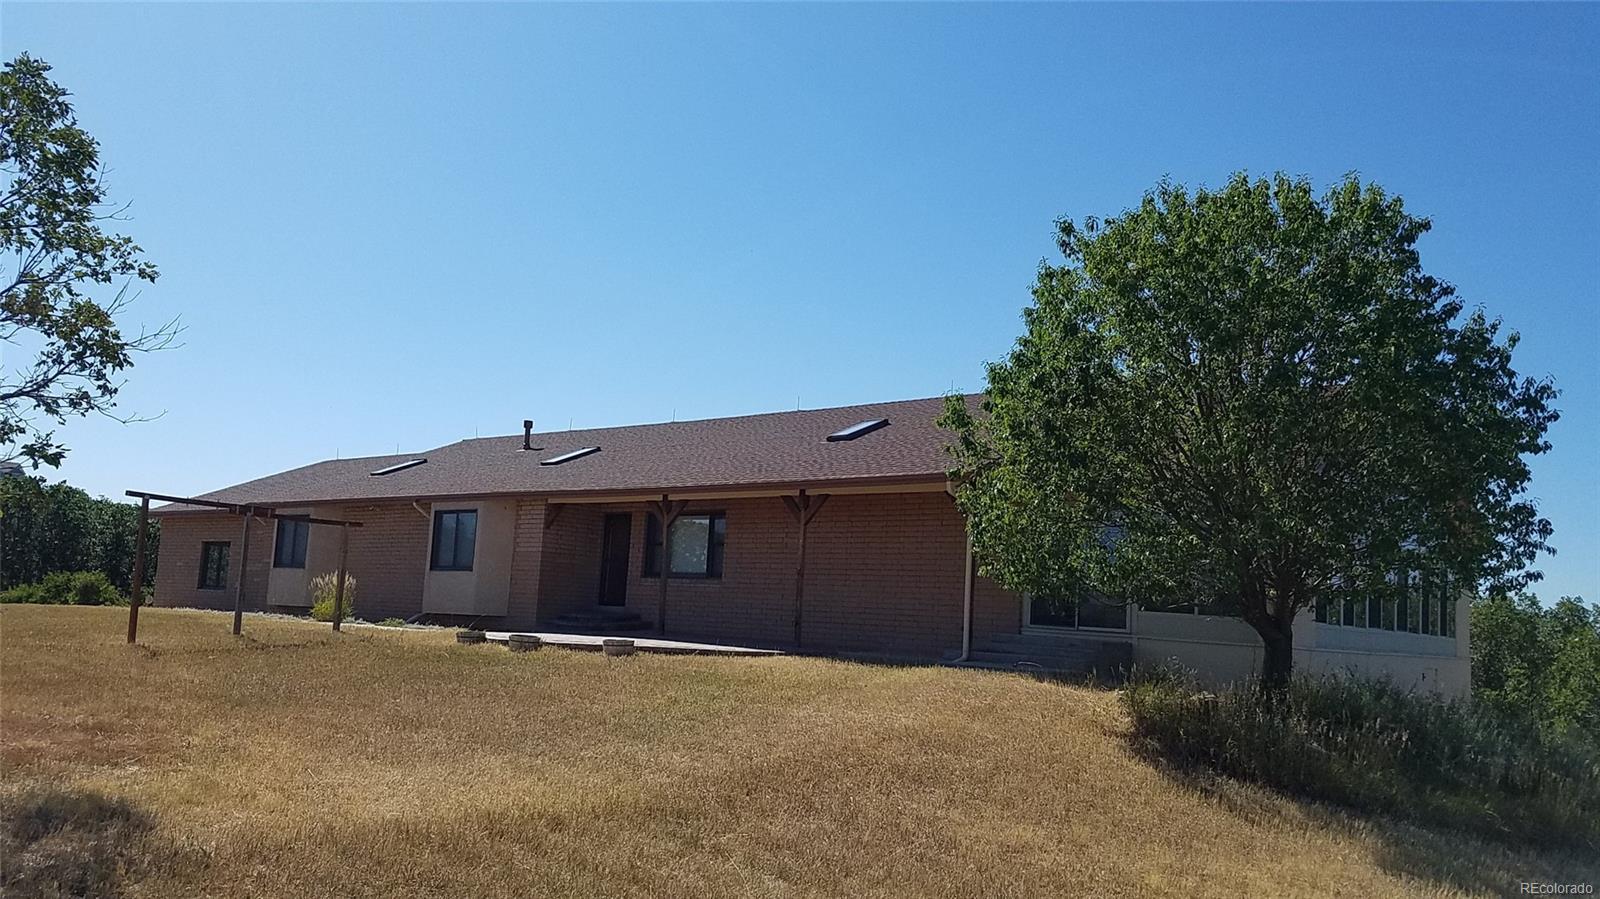 1547 N Rocky View Road, Castle Rock, CO 80108 - Castle Rock, CO real estate listing